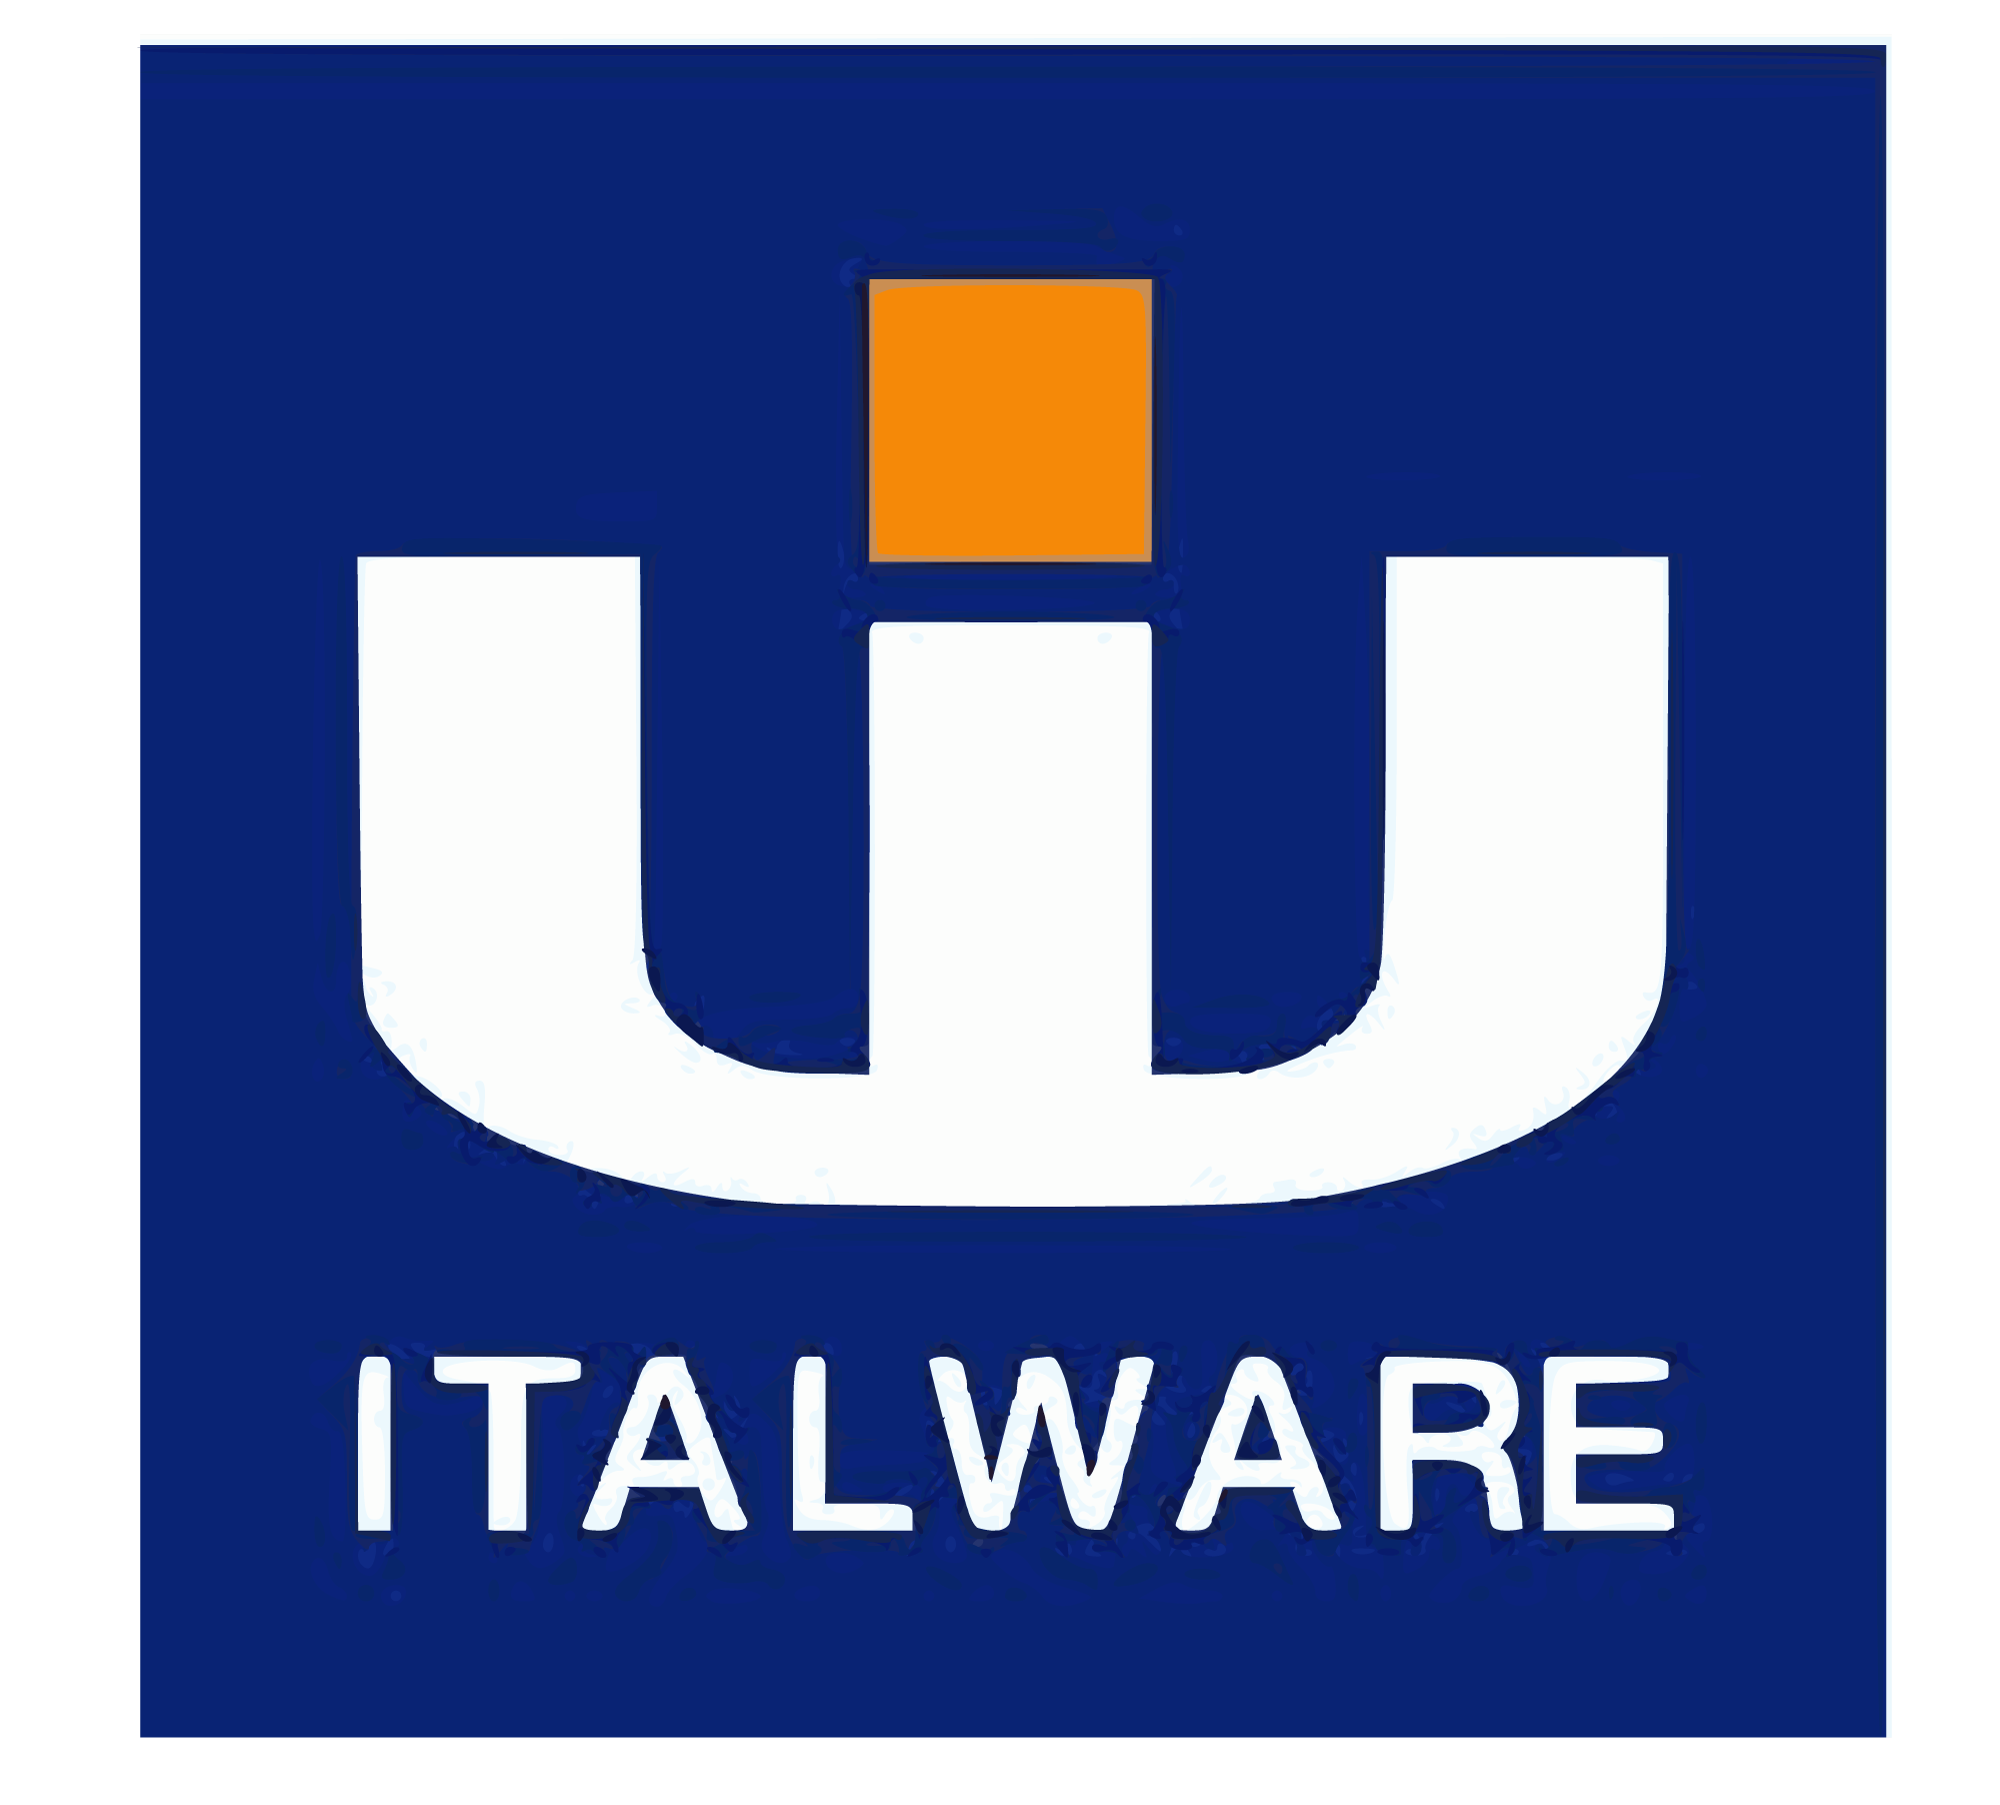 Italware